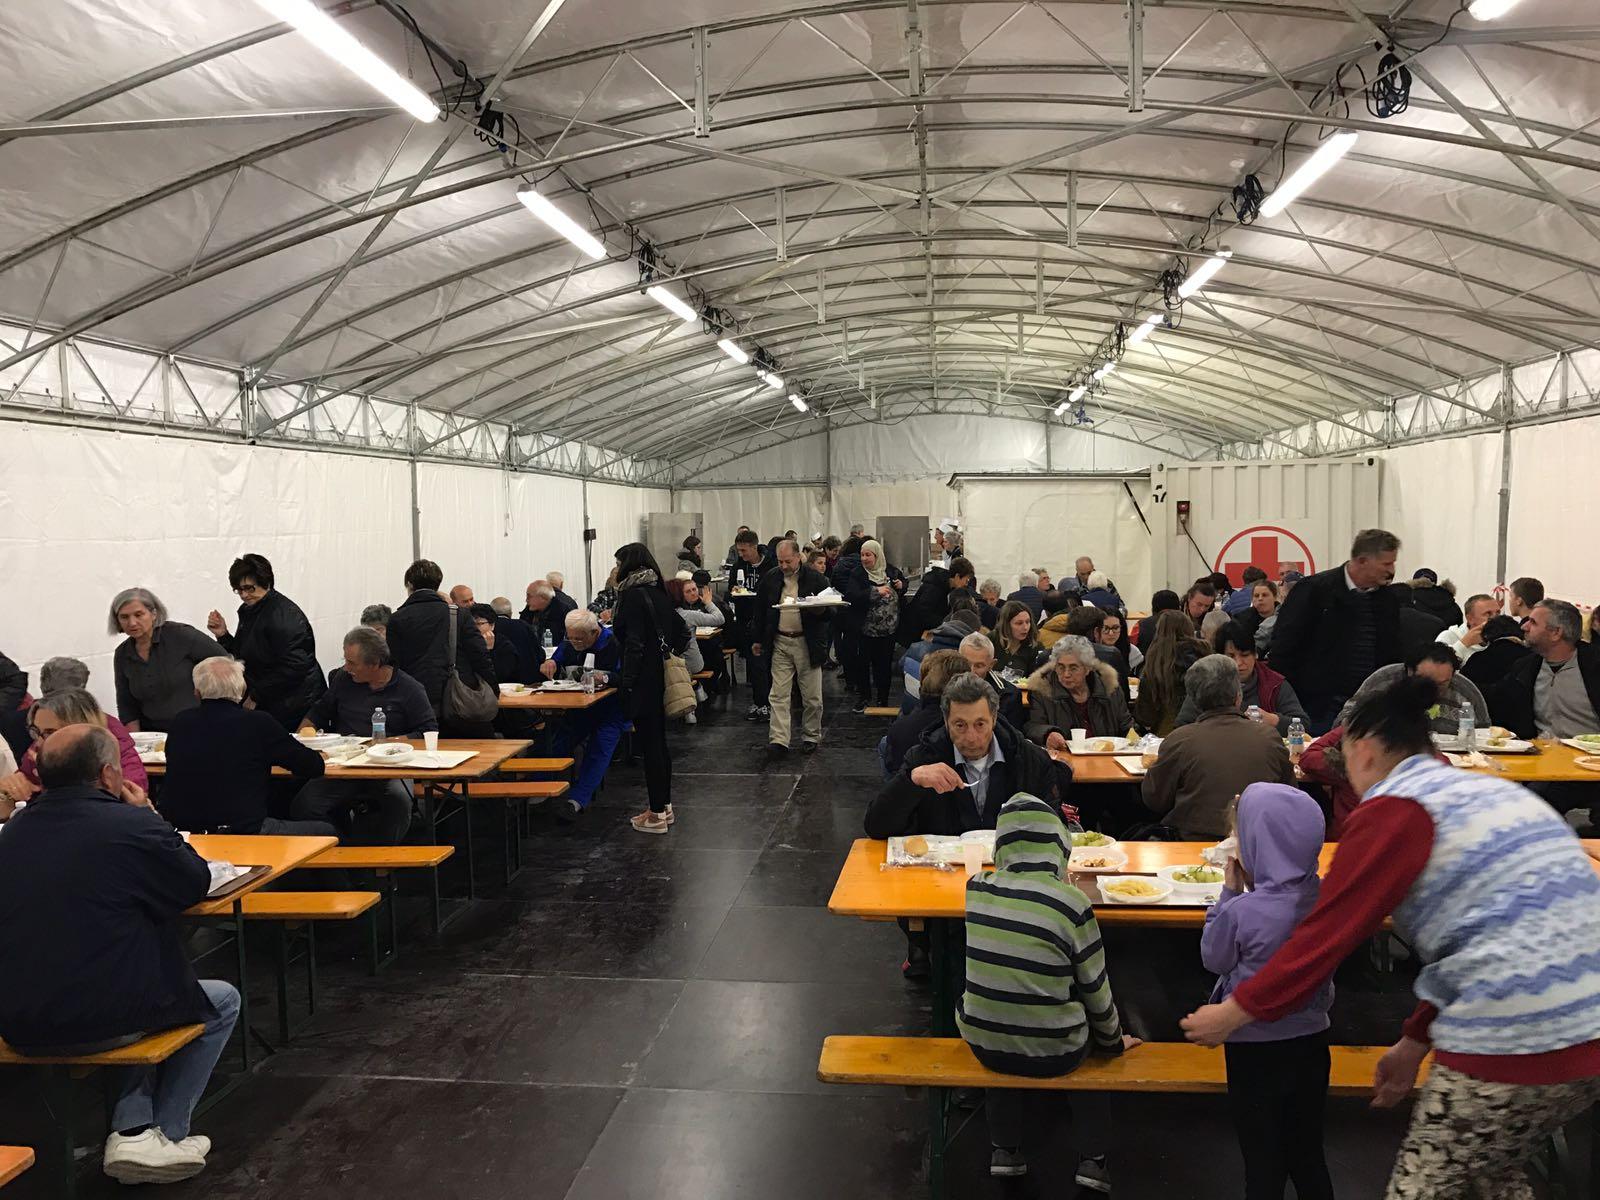 Da Civitanova Marche pranzo di pesce per i terremotati di Camerino